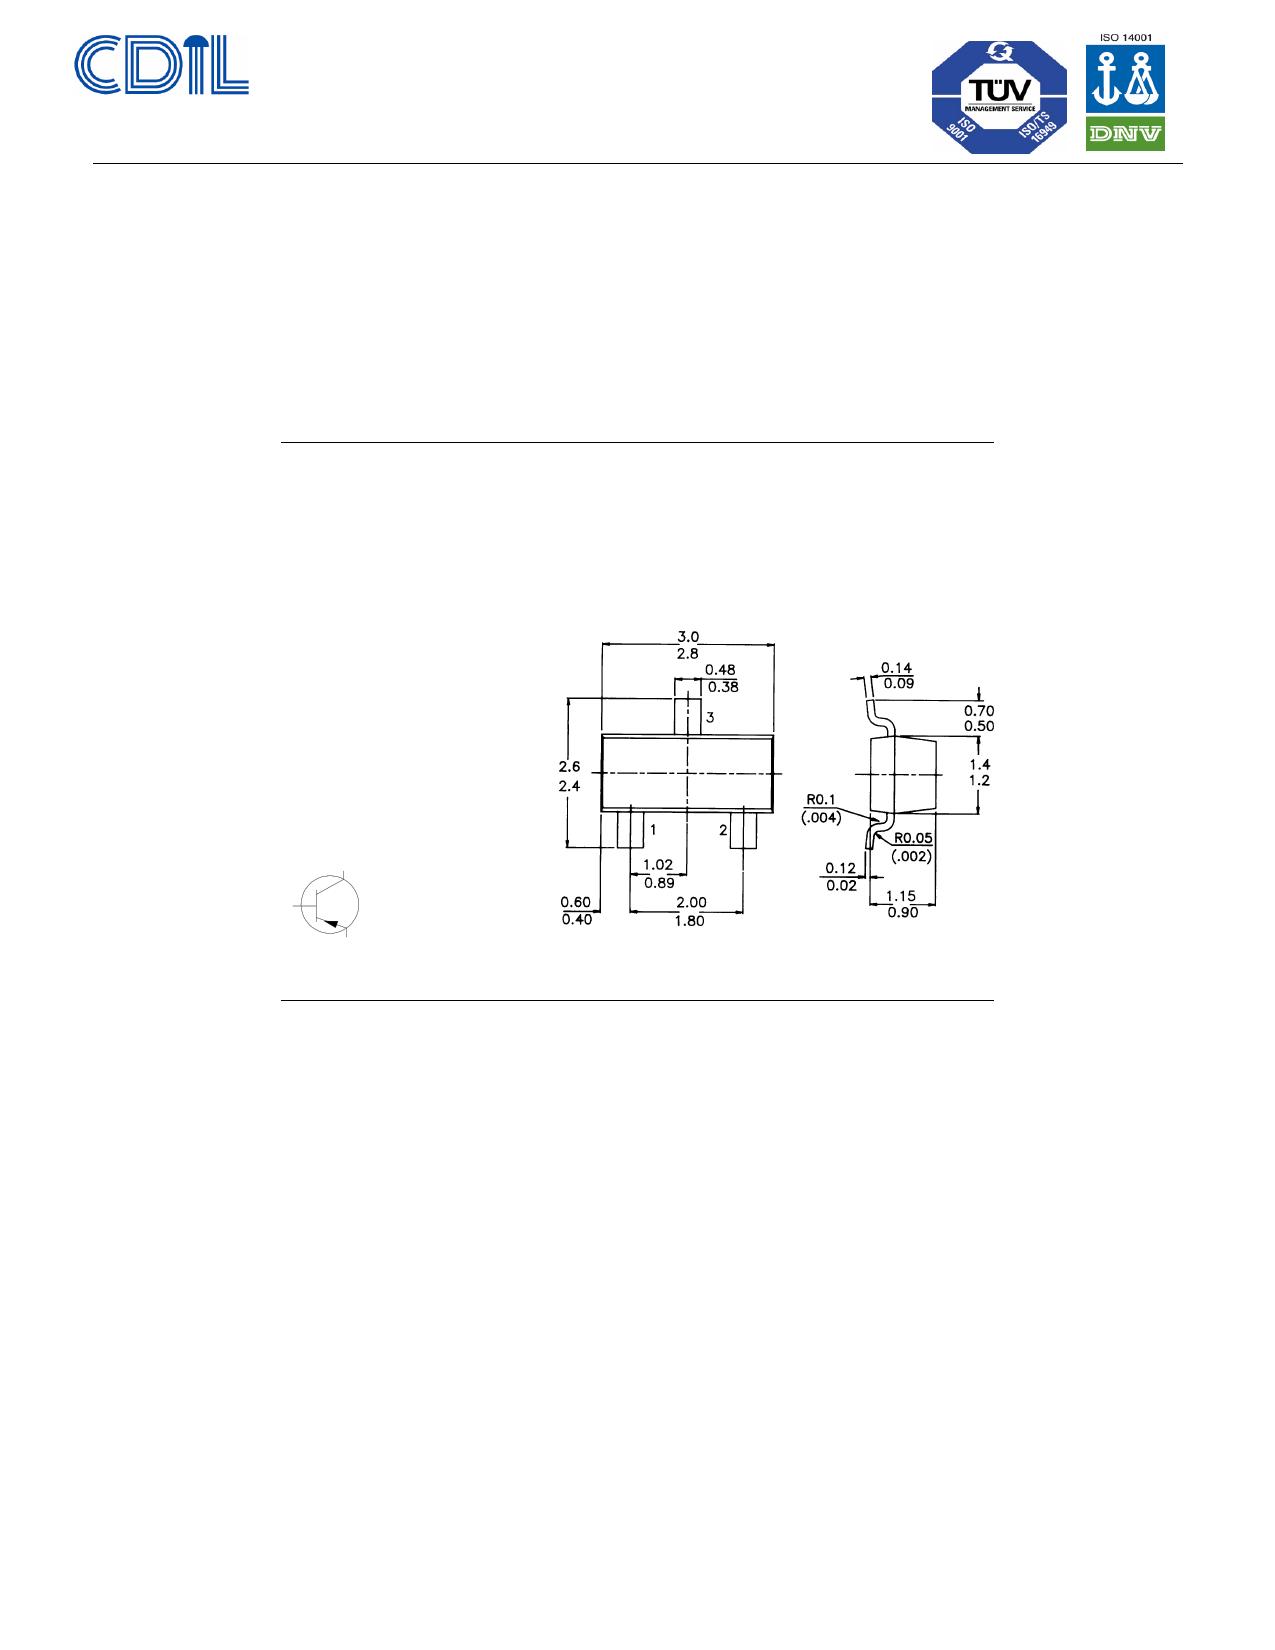 BCX71J 데이터시트 및 BCX71J PDF